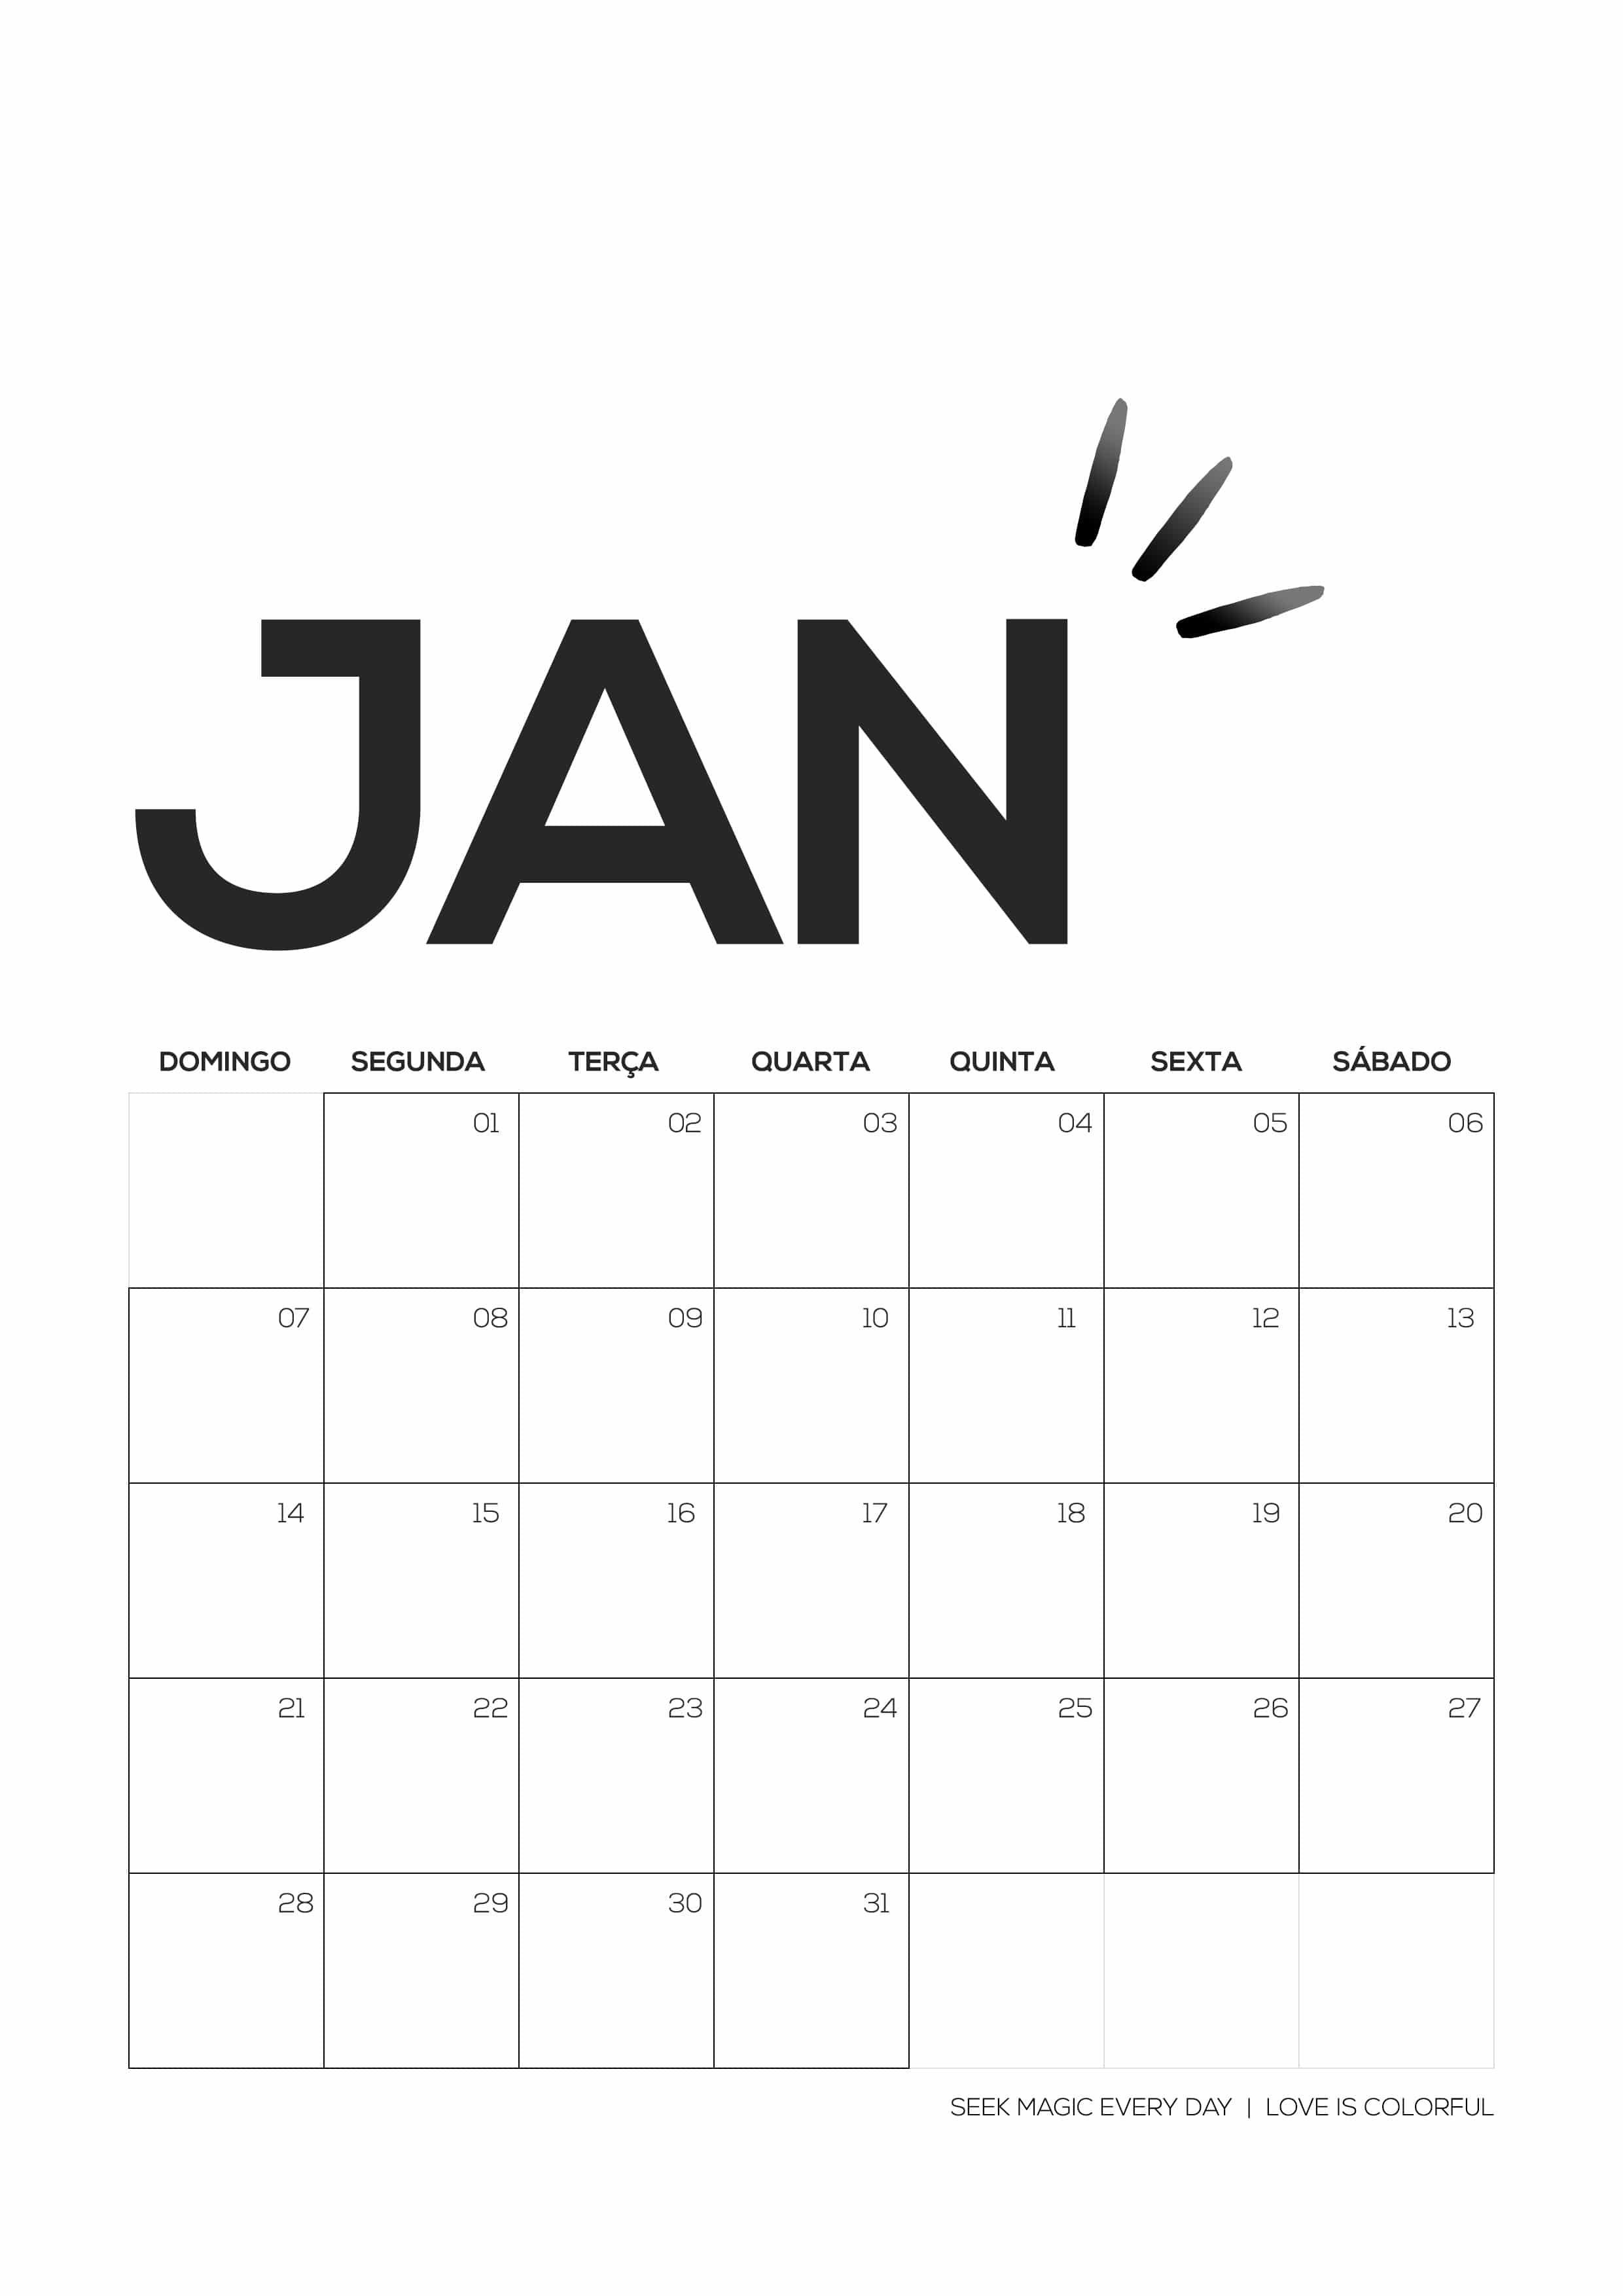 Calendario Para Imprimir 2019 Janeiro Más Reciente Calendário 2018 Para Imprimir — Love is Colorful Of Calendario Para Imprimir 2019 Janeiro Actual 2019 2018 Calendar Printable with Holidays List Kalender Kalendar